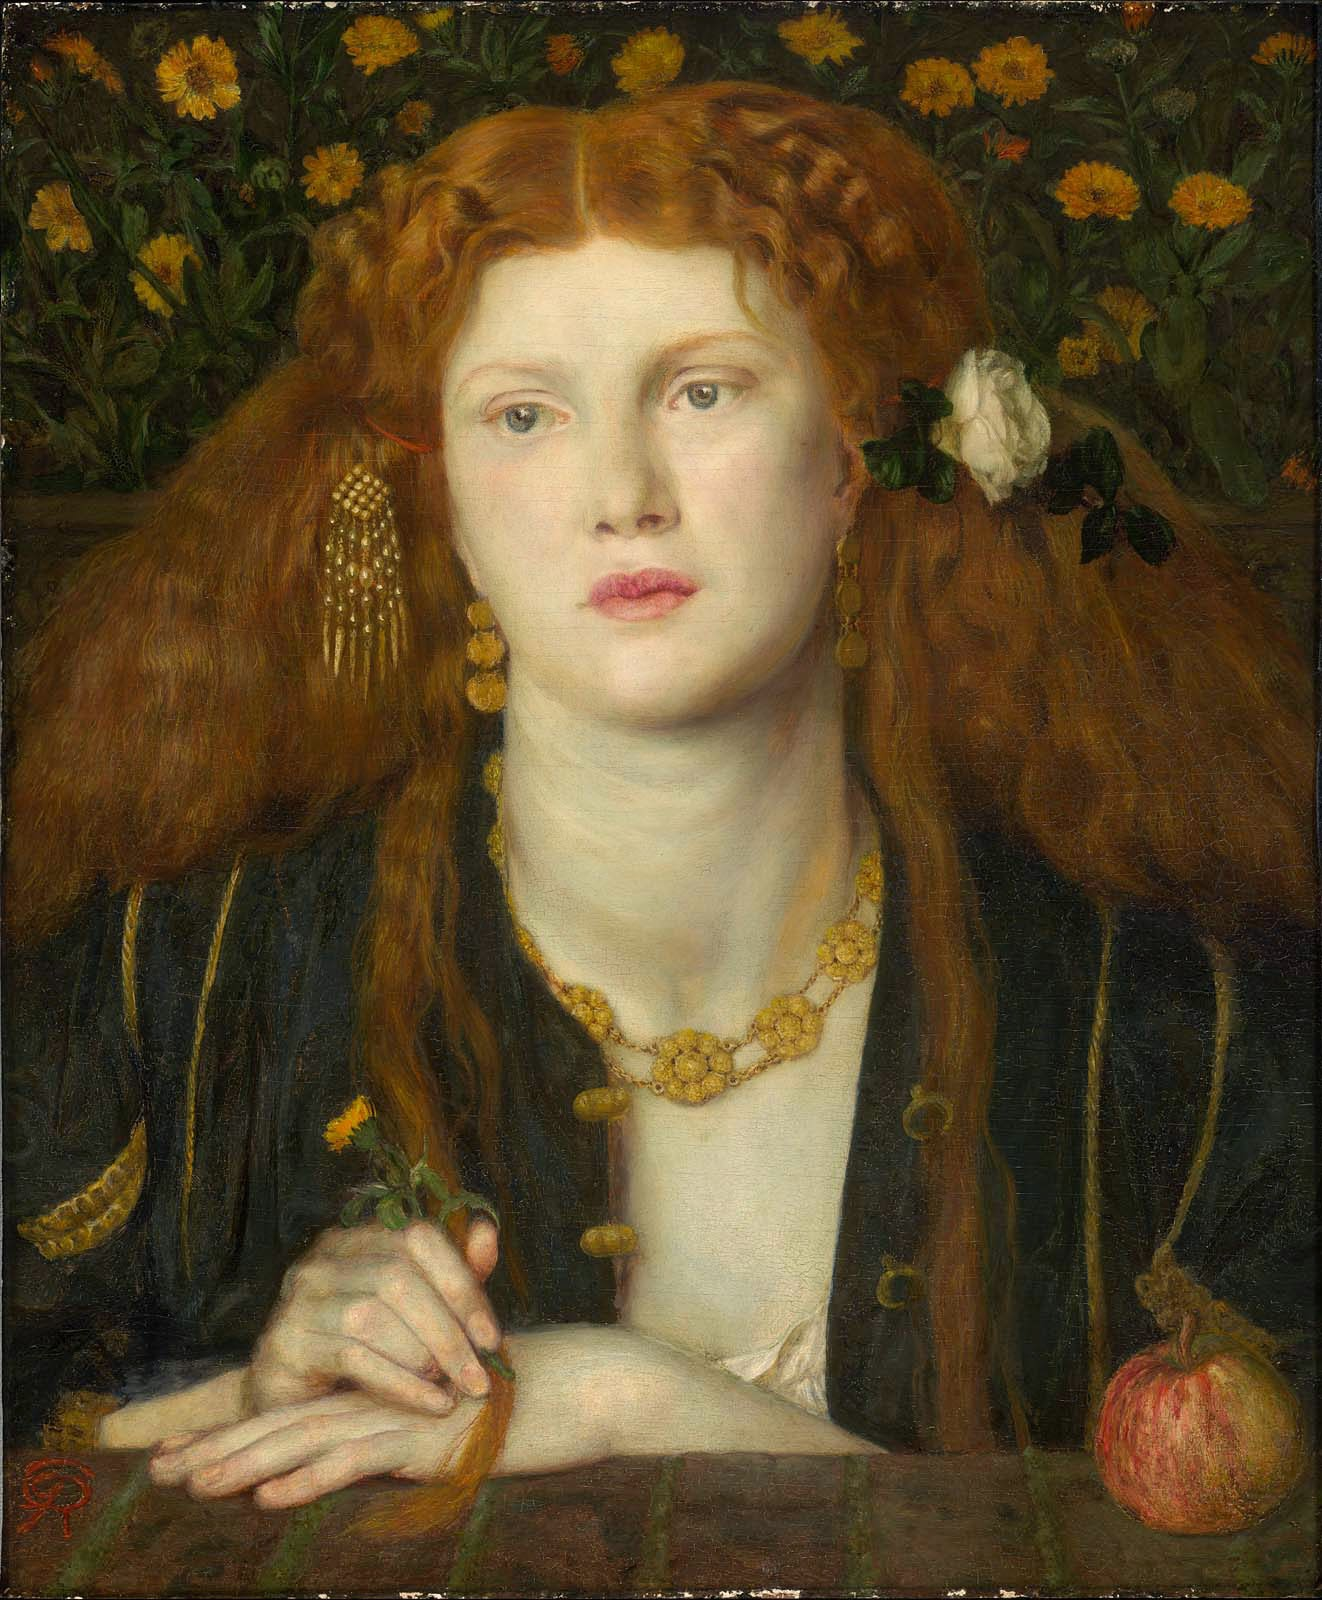 Dante Gabriel Rossetti - Bocca baciata,1859